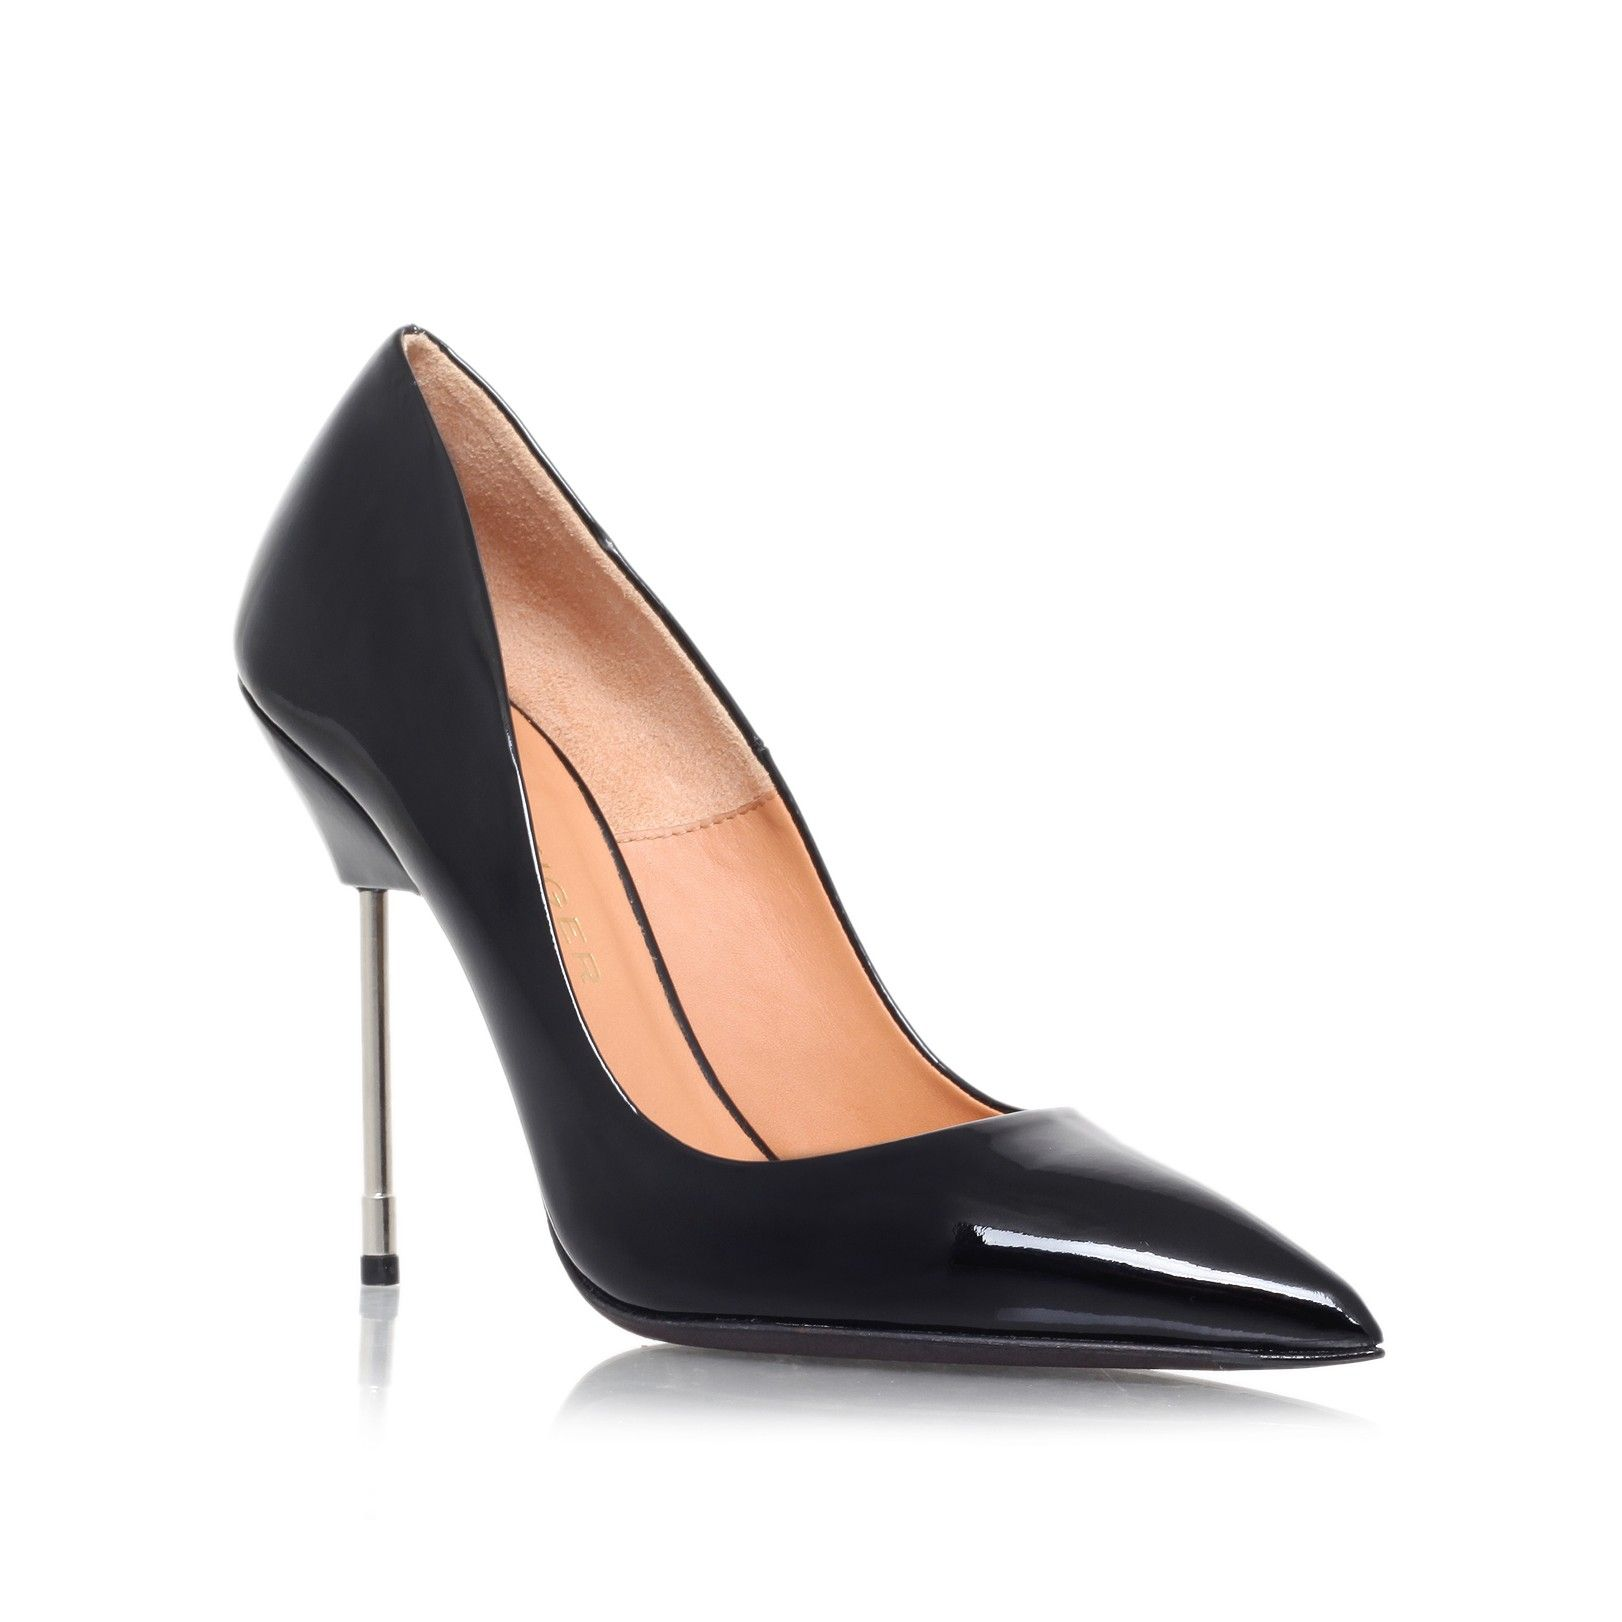 5b65cdc7e0b Kurt Geiger 'Britton' heels black | Things I Want in 2019 | Black ...